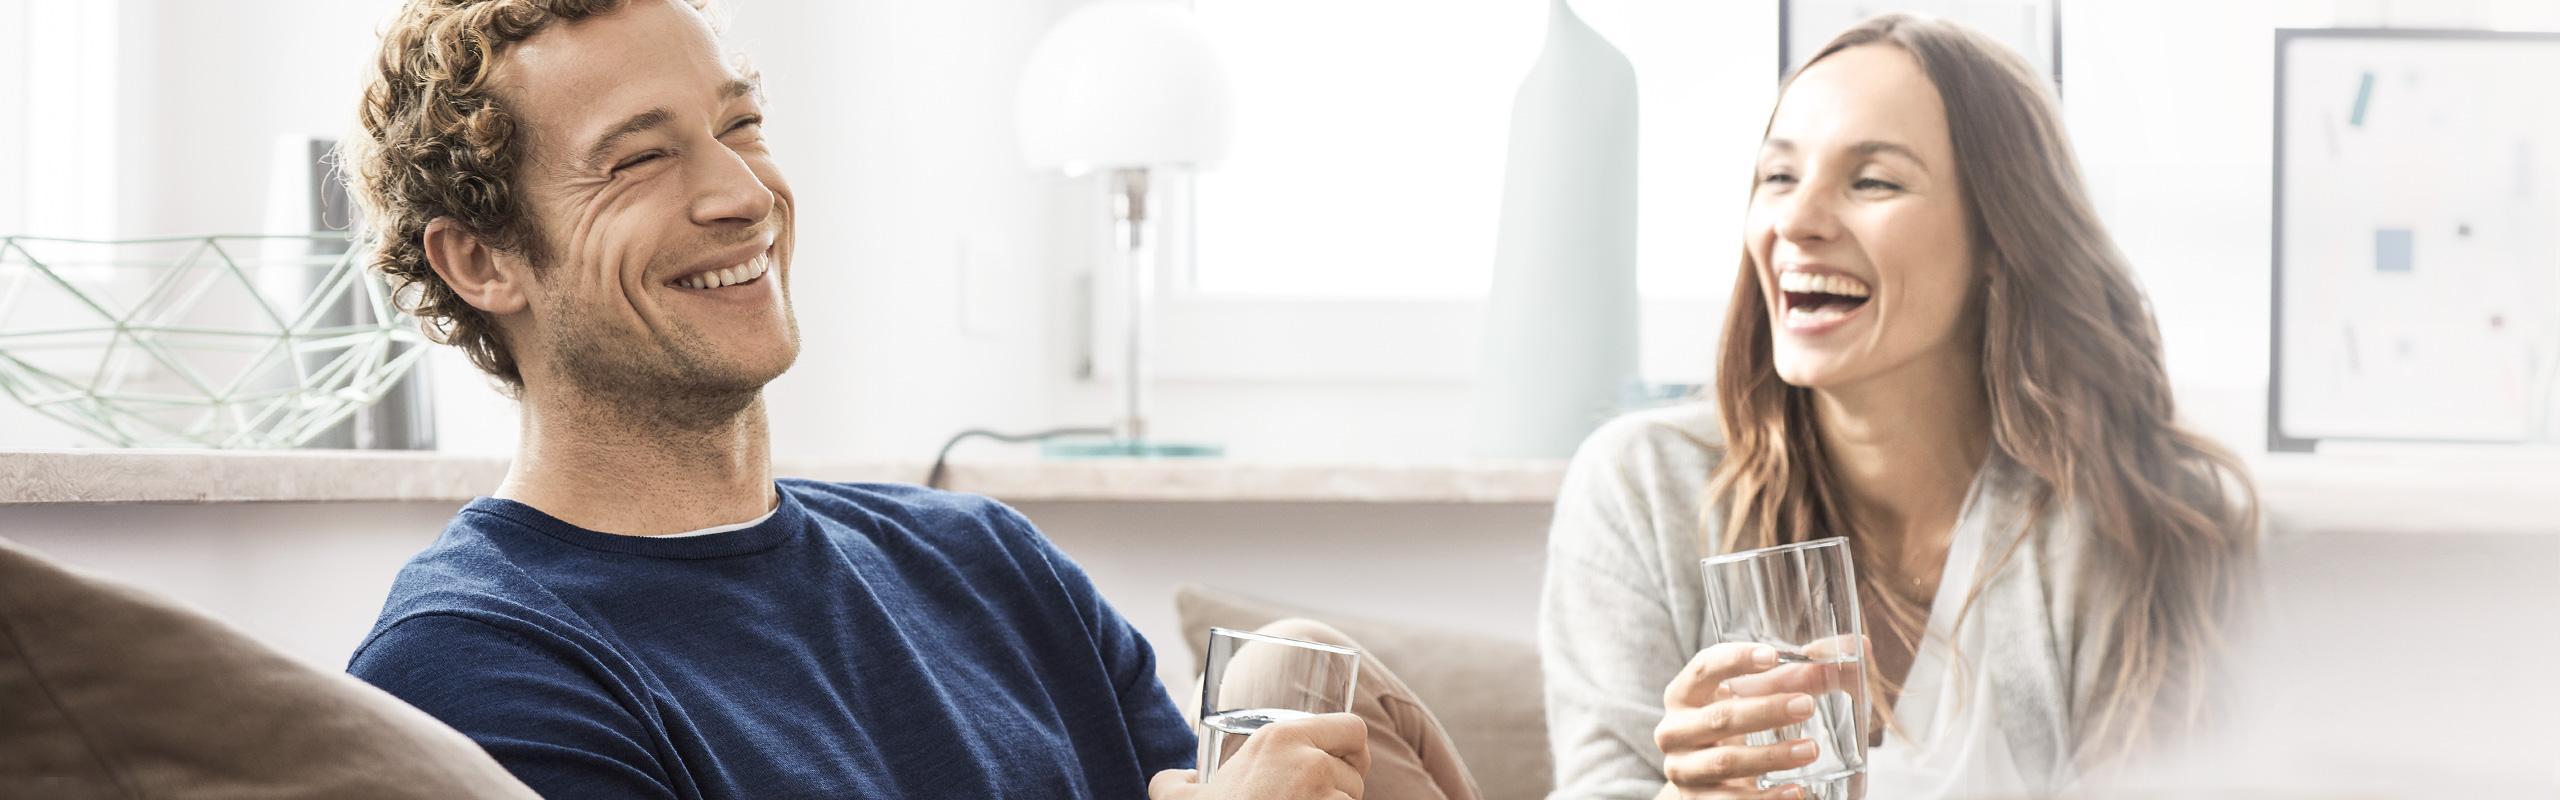 Happy couple in living room